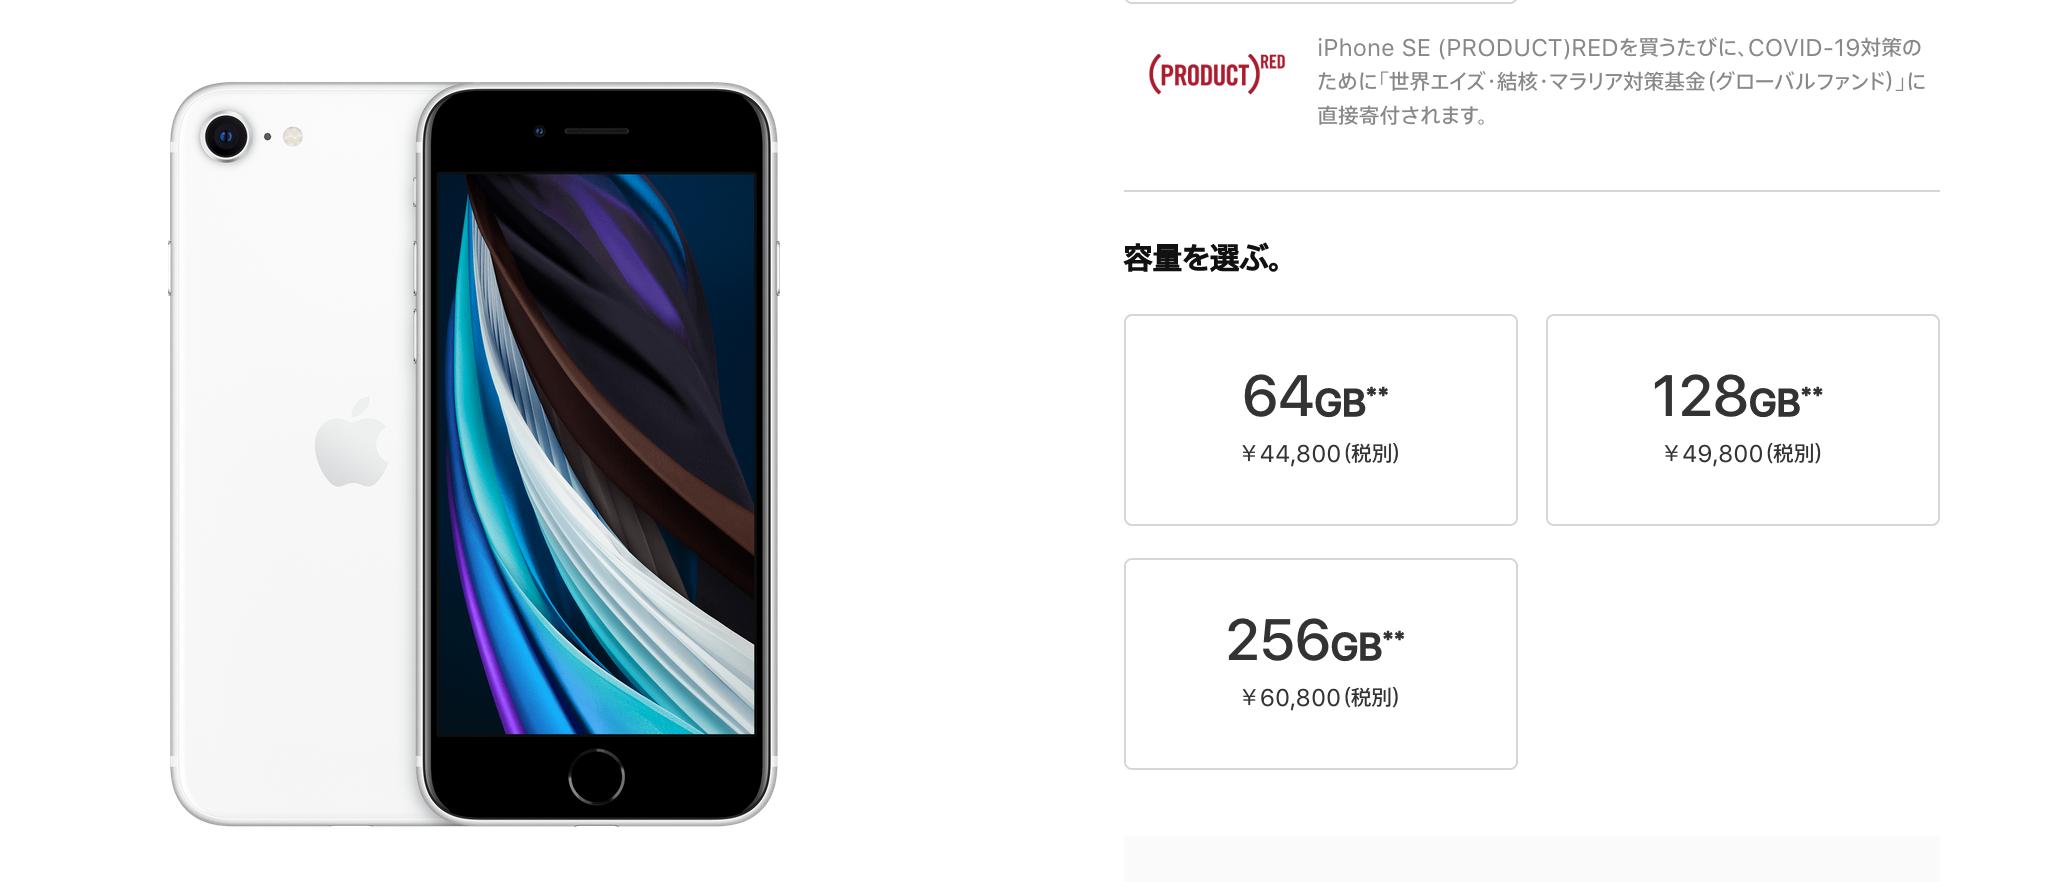 iPhoneSE 価格